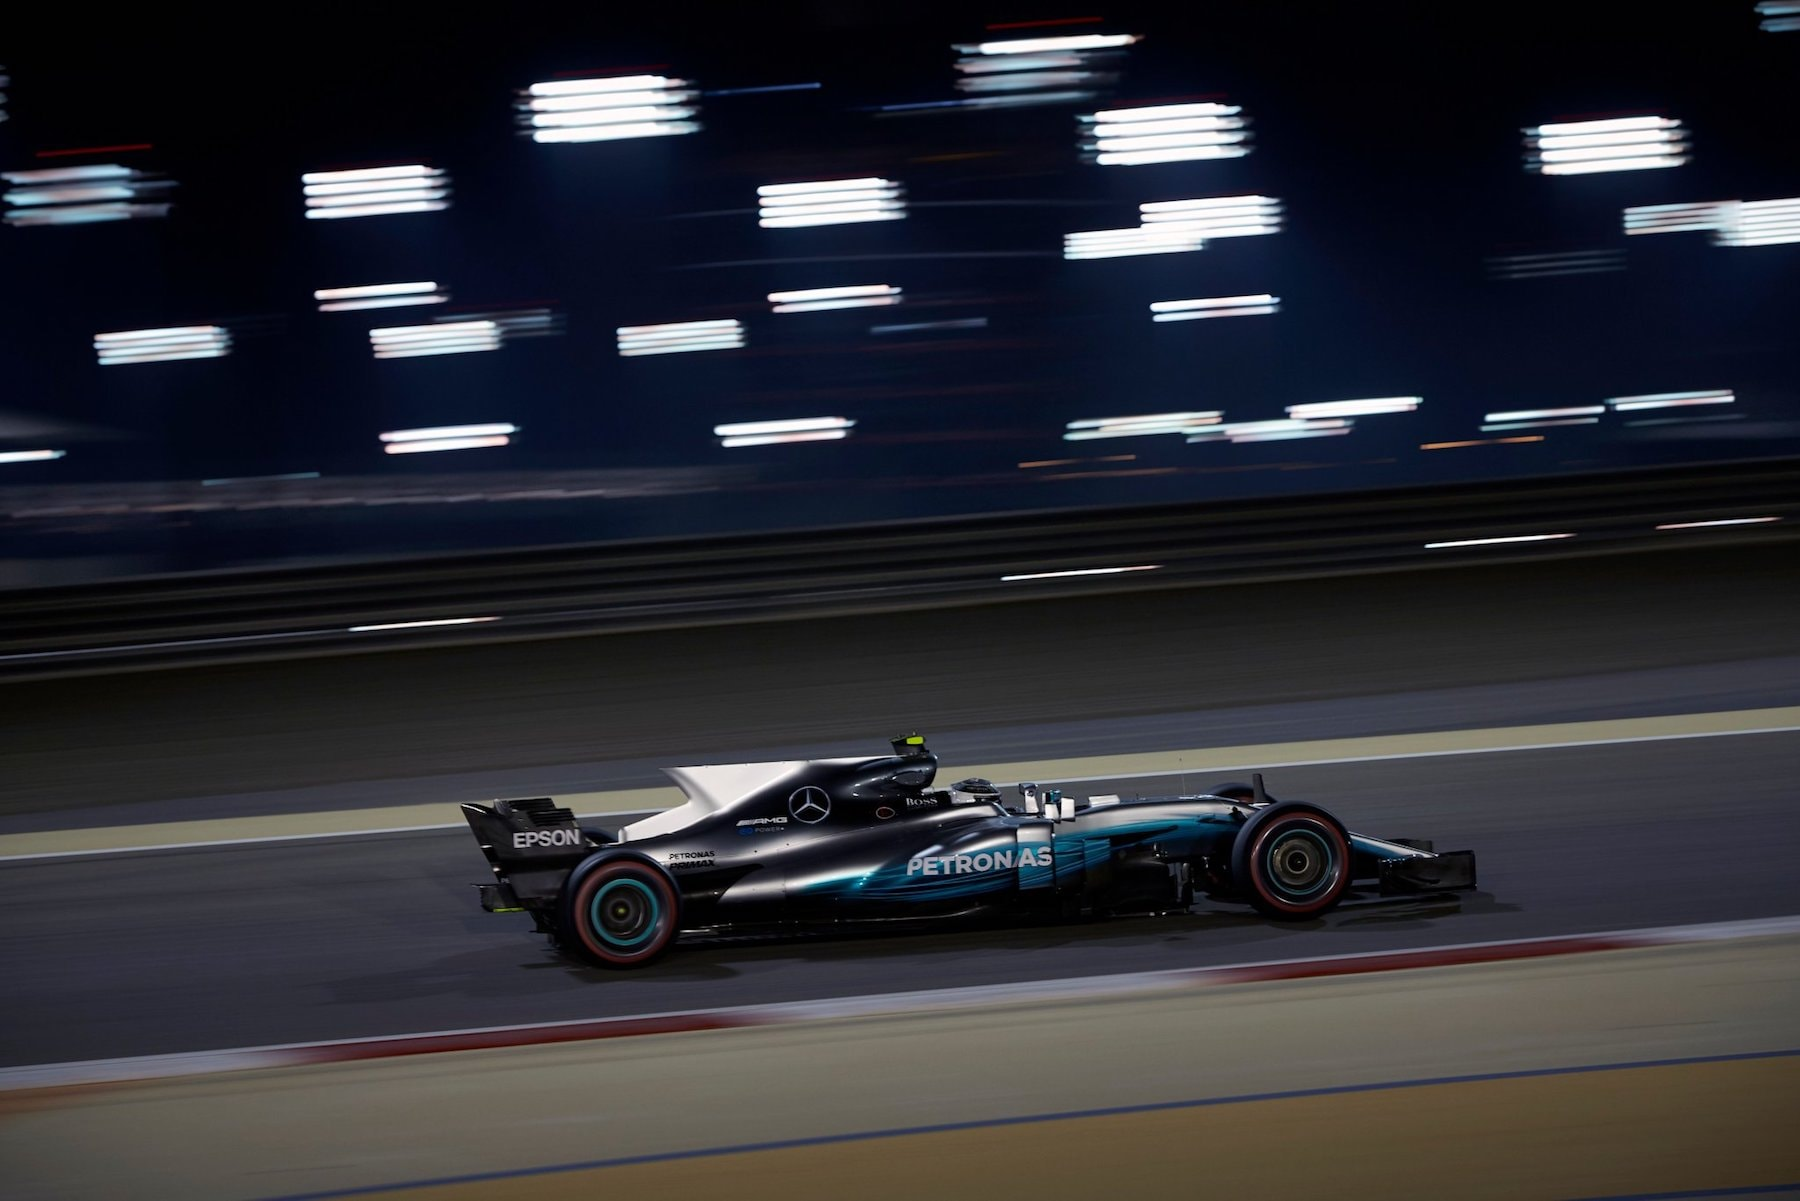 2017 Valtteri Bottas   Mercedes W08   2017 Bahrain GP Pole 1 copy.jpg